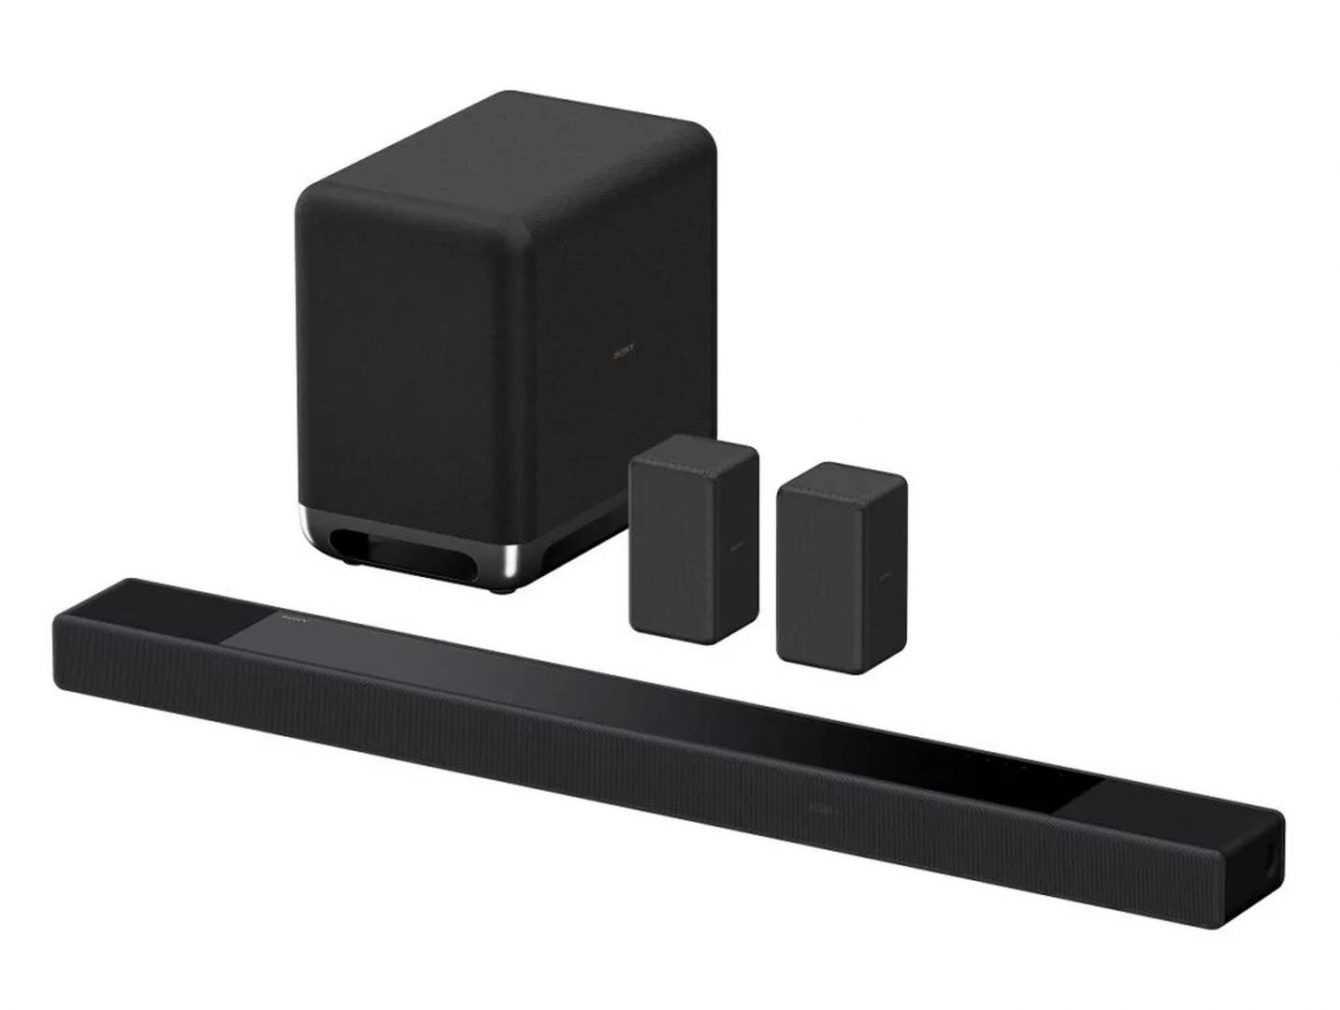 Sony HT-A7000: una soundbar 7.2.1 per un audio cristallino